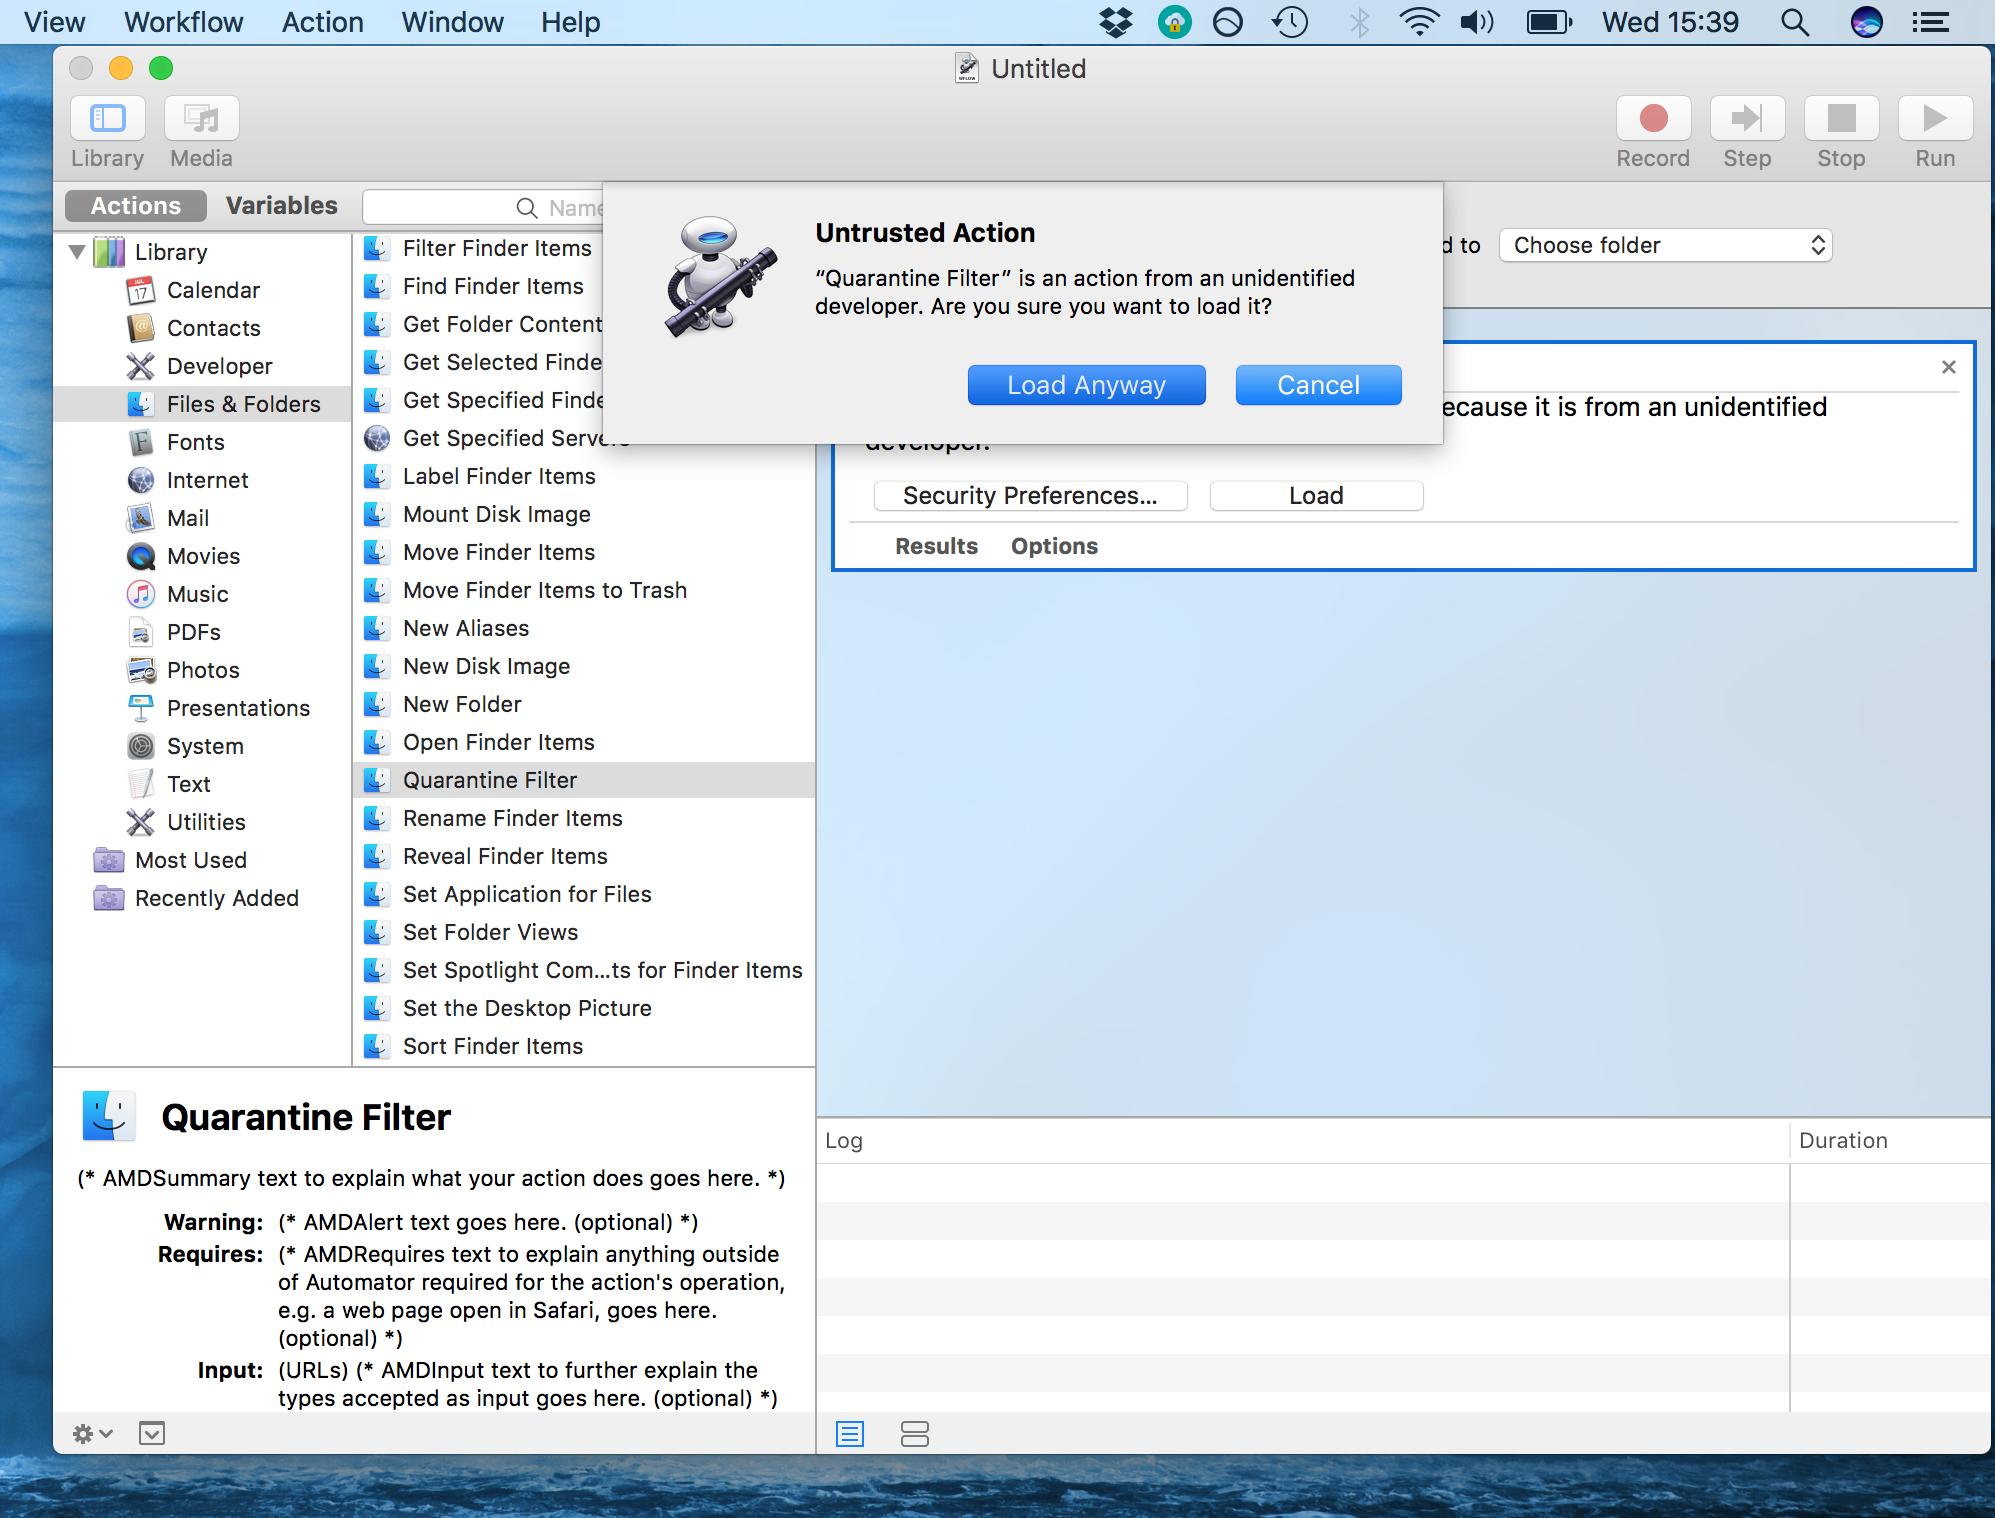 Change Download Destination On Mac